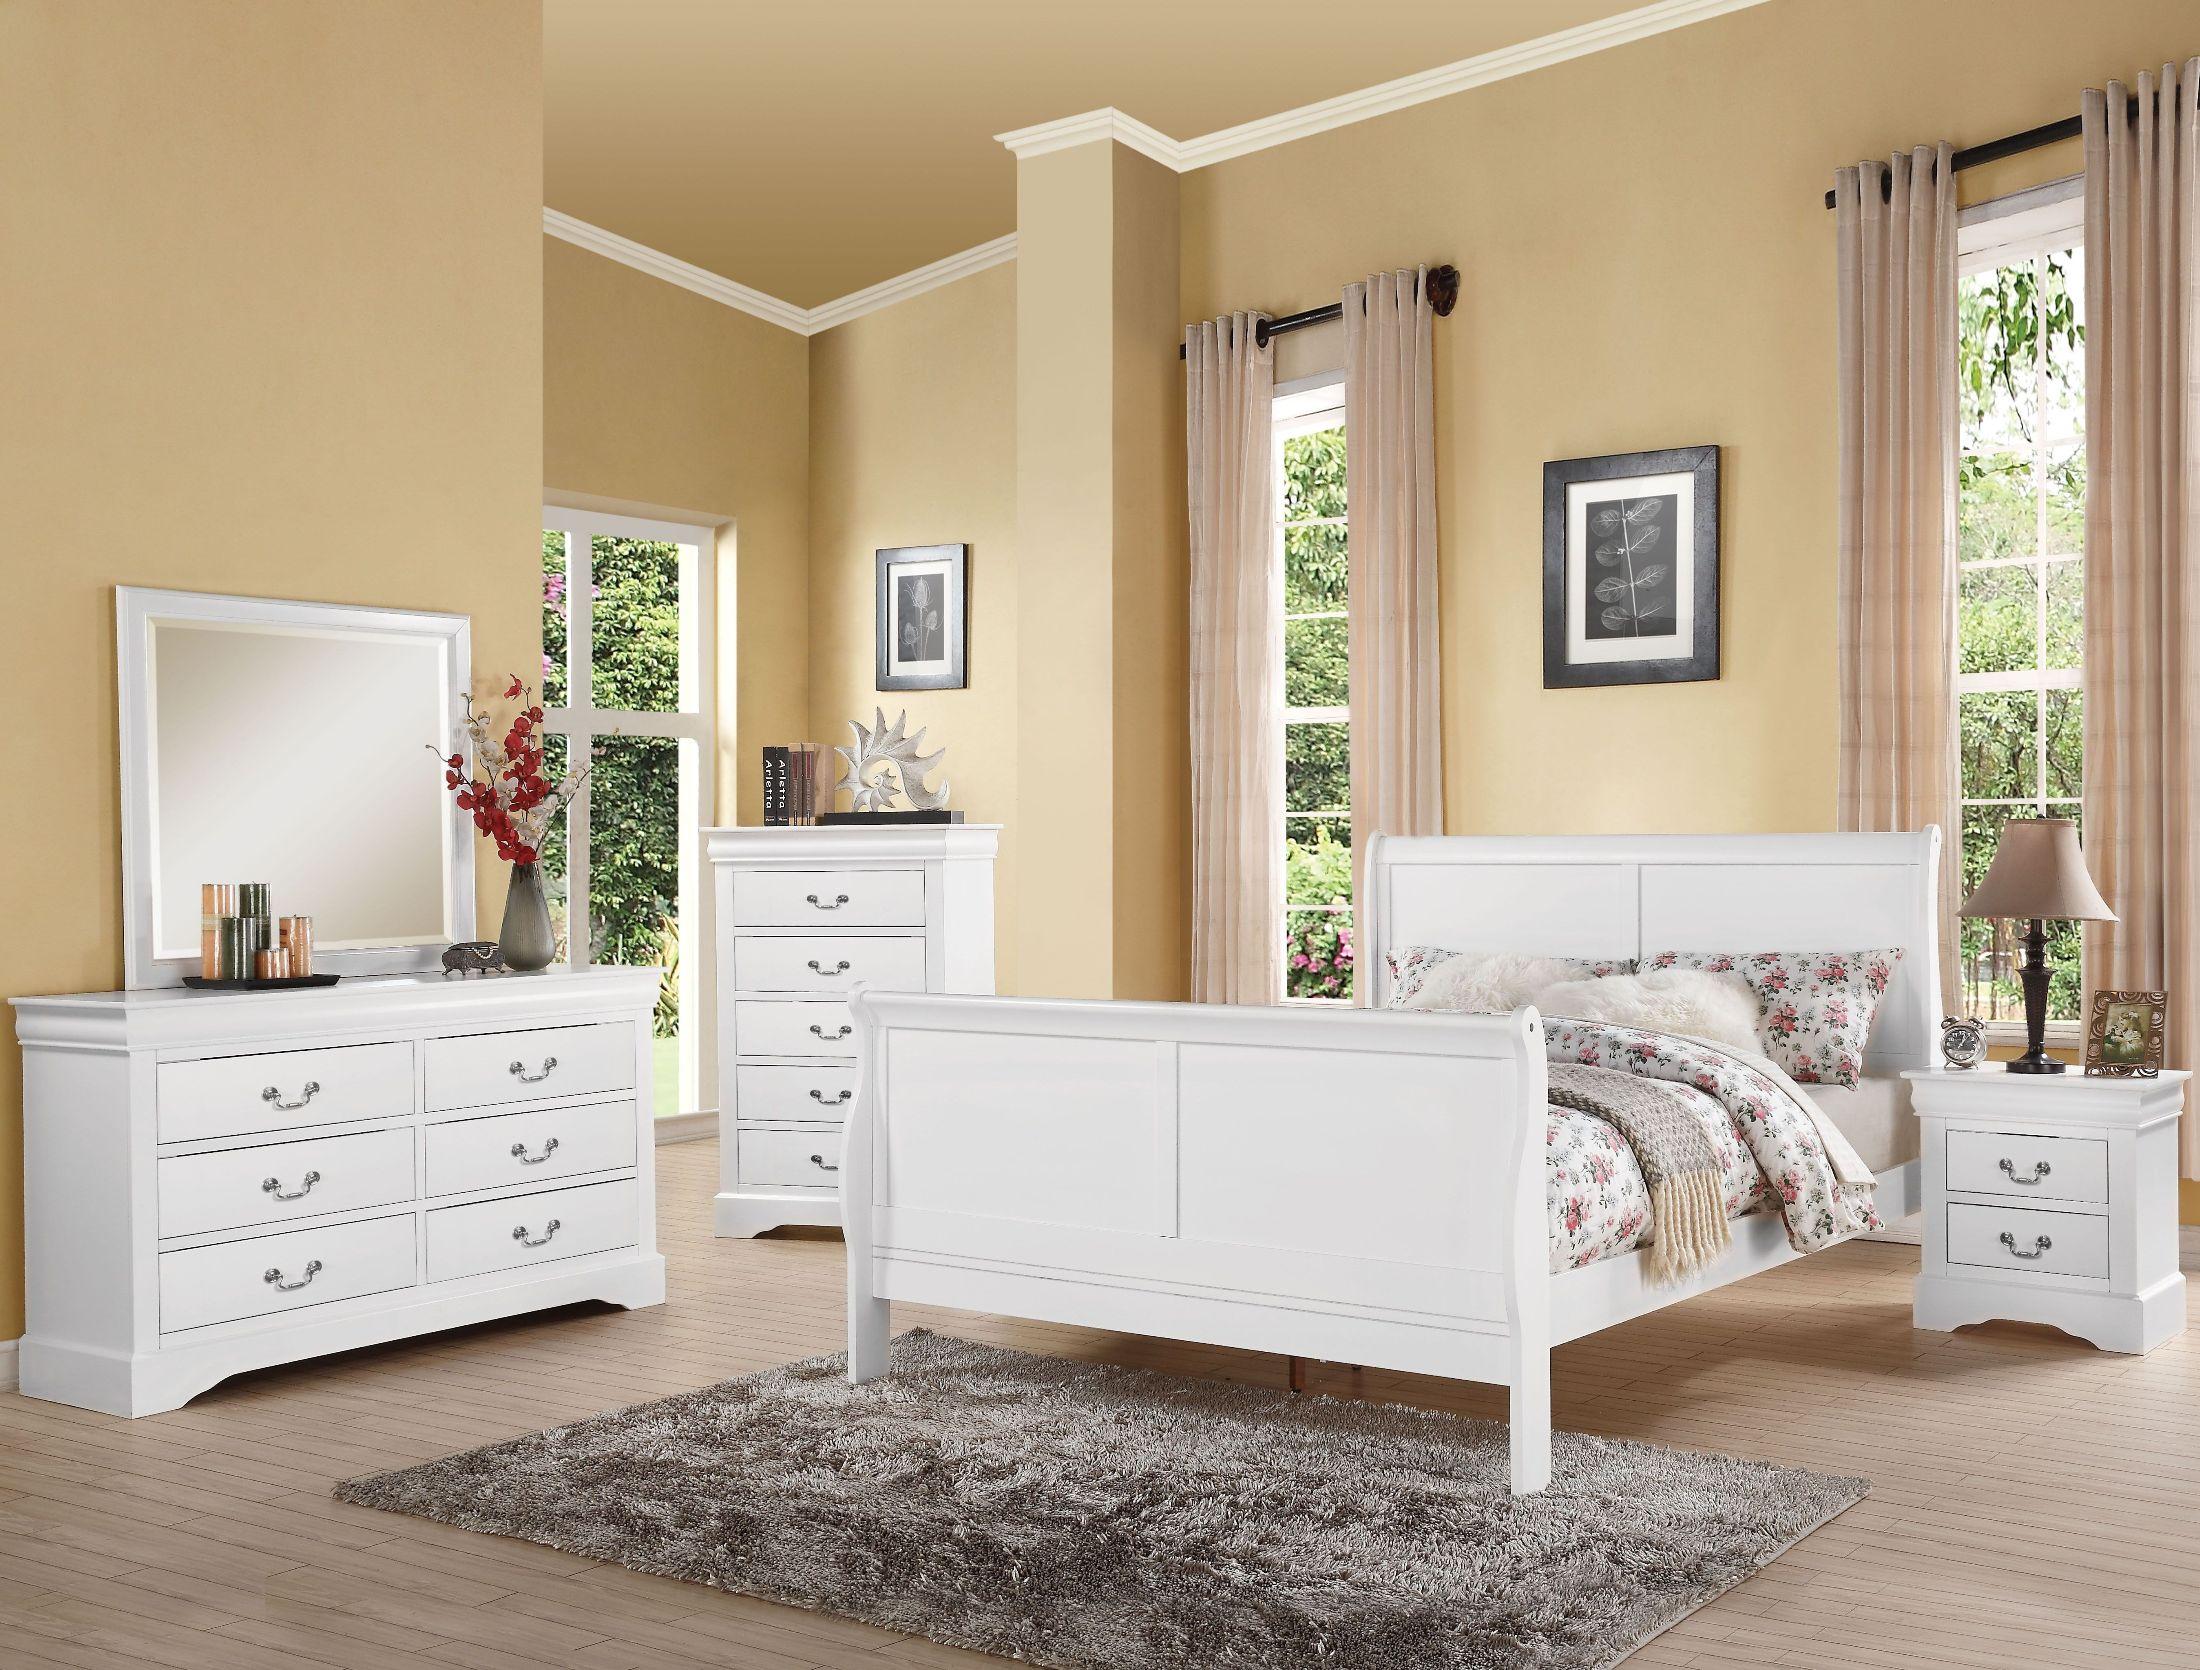 Acme louis philippe iii white sleigh bedroom set louis - Louis philippe bedroom collection ...